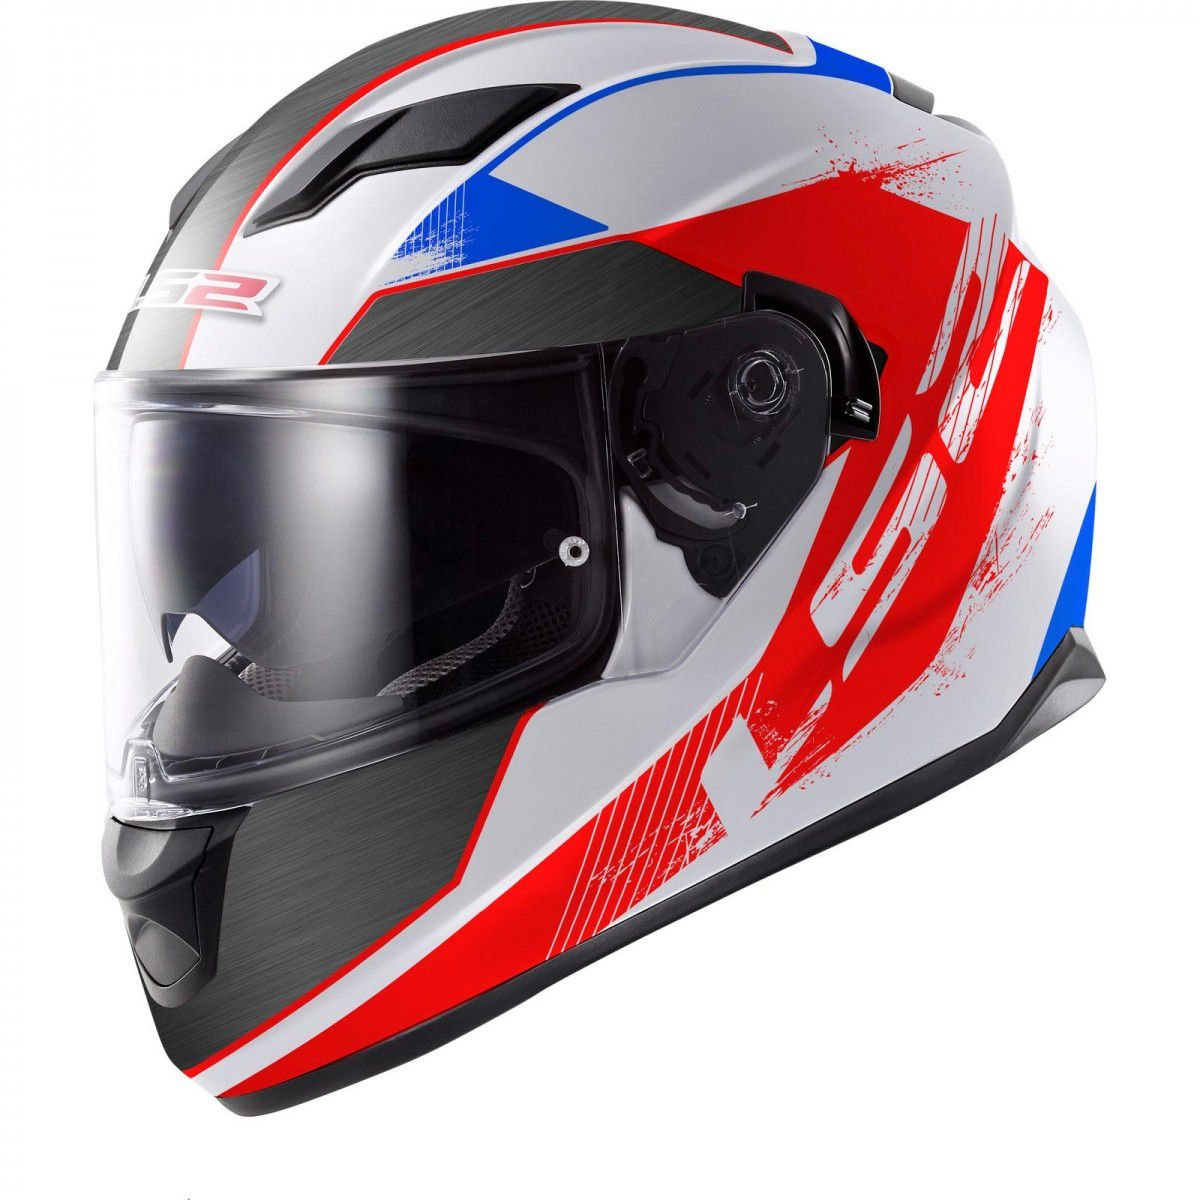 CAPACETE LS2 FF320 STREAM STINGERS RED/BLUE  - Motosports